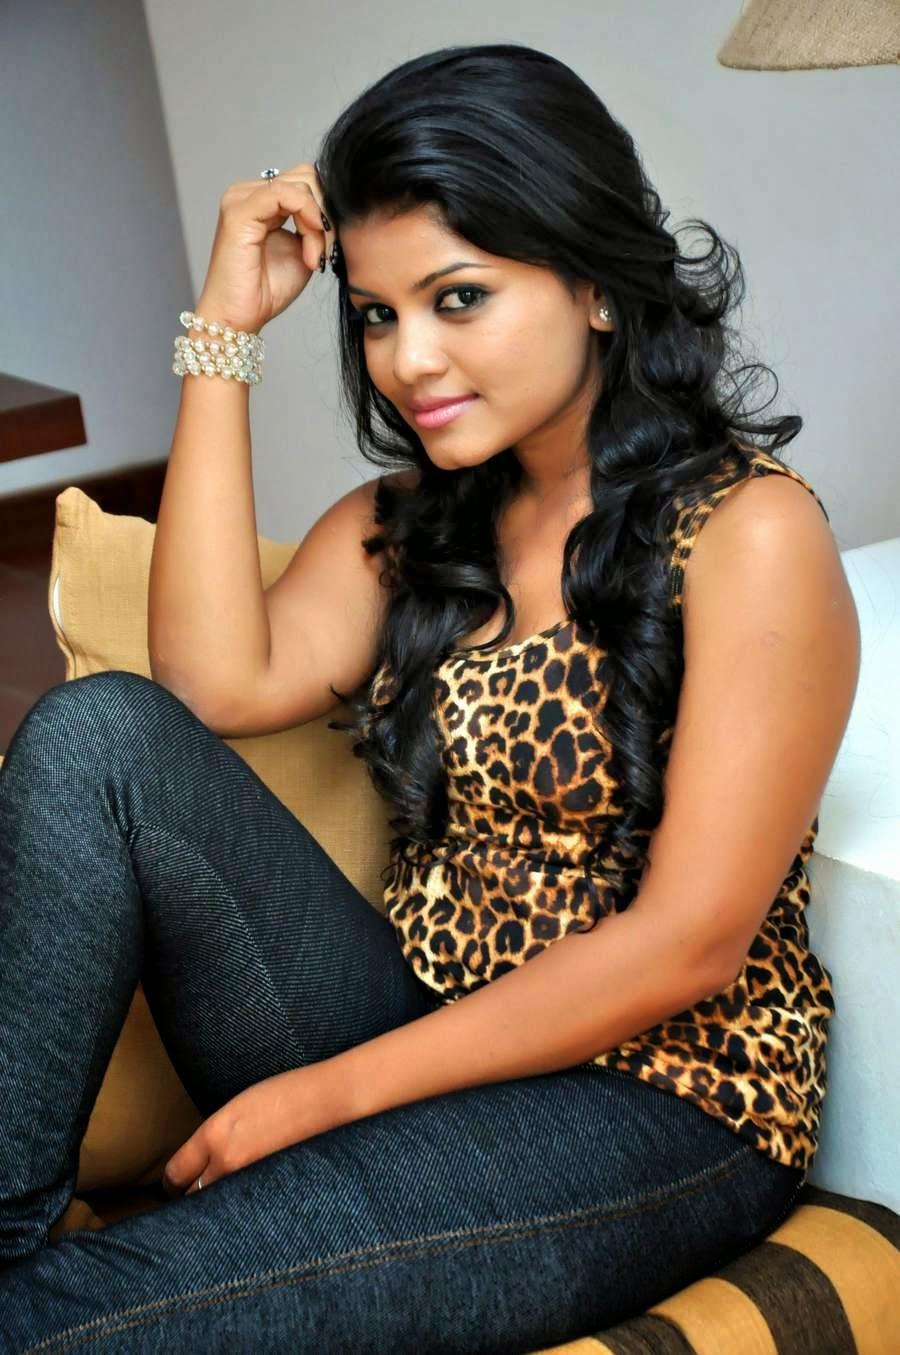 yureni noshika / Gossip Lanka News - Gossip Lanka News